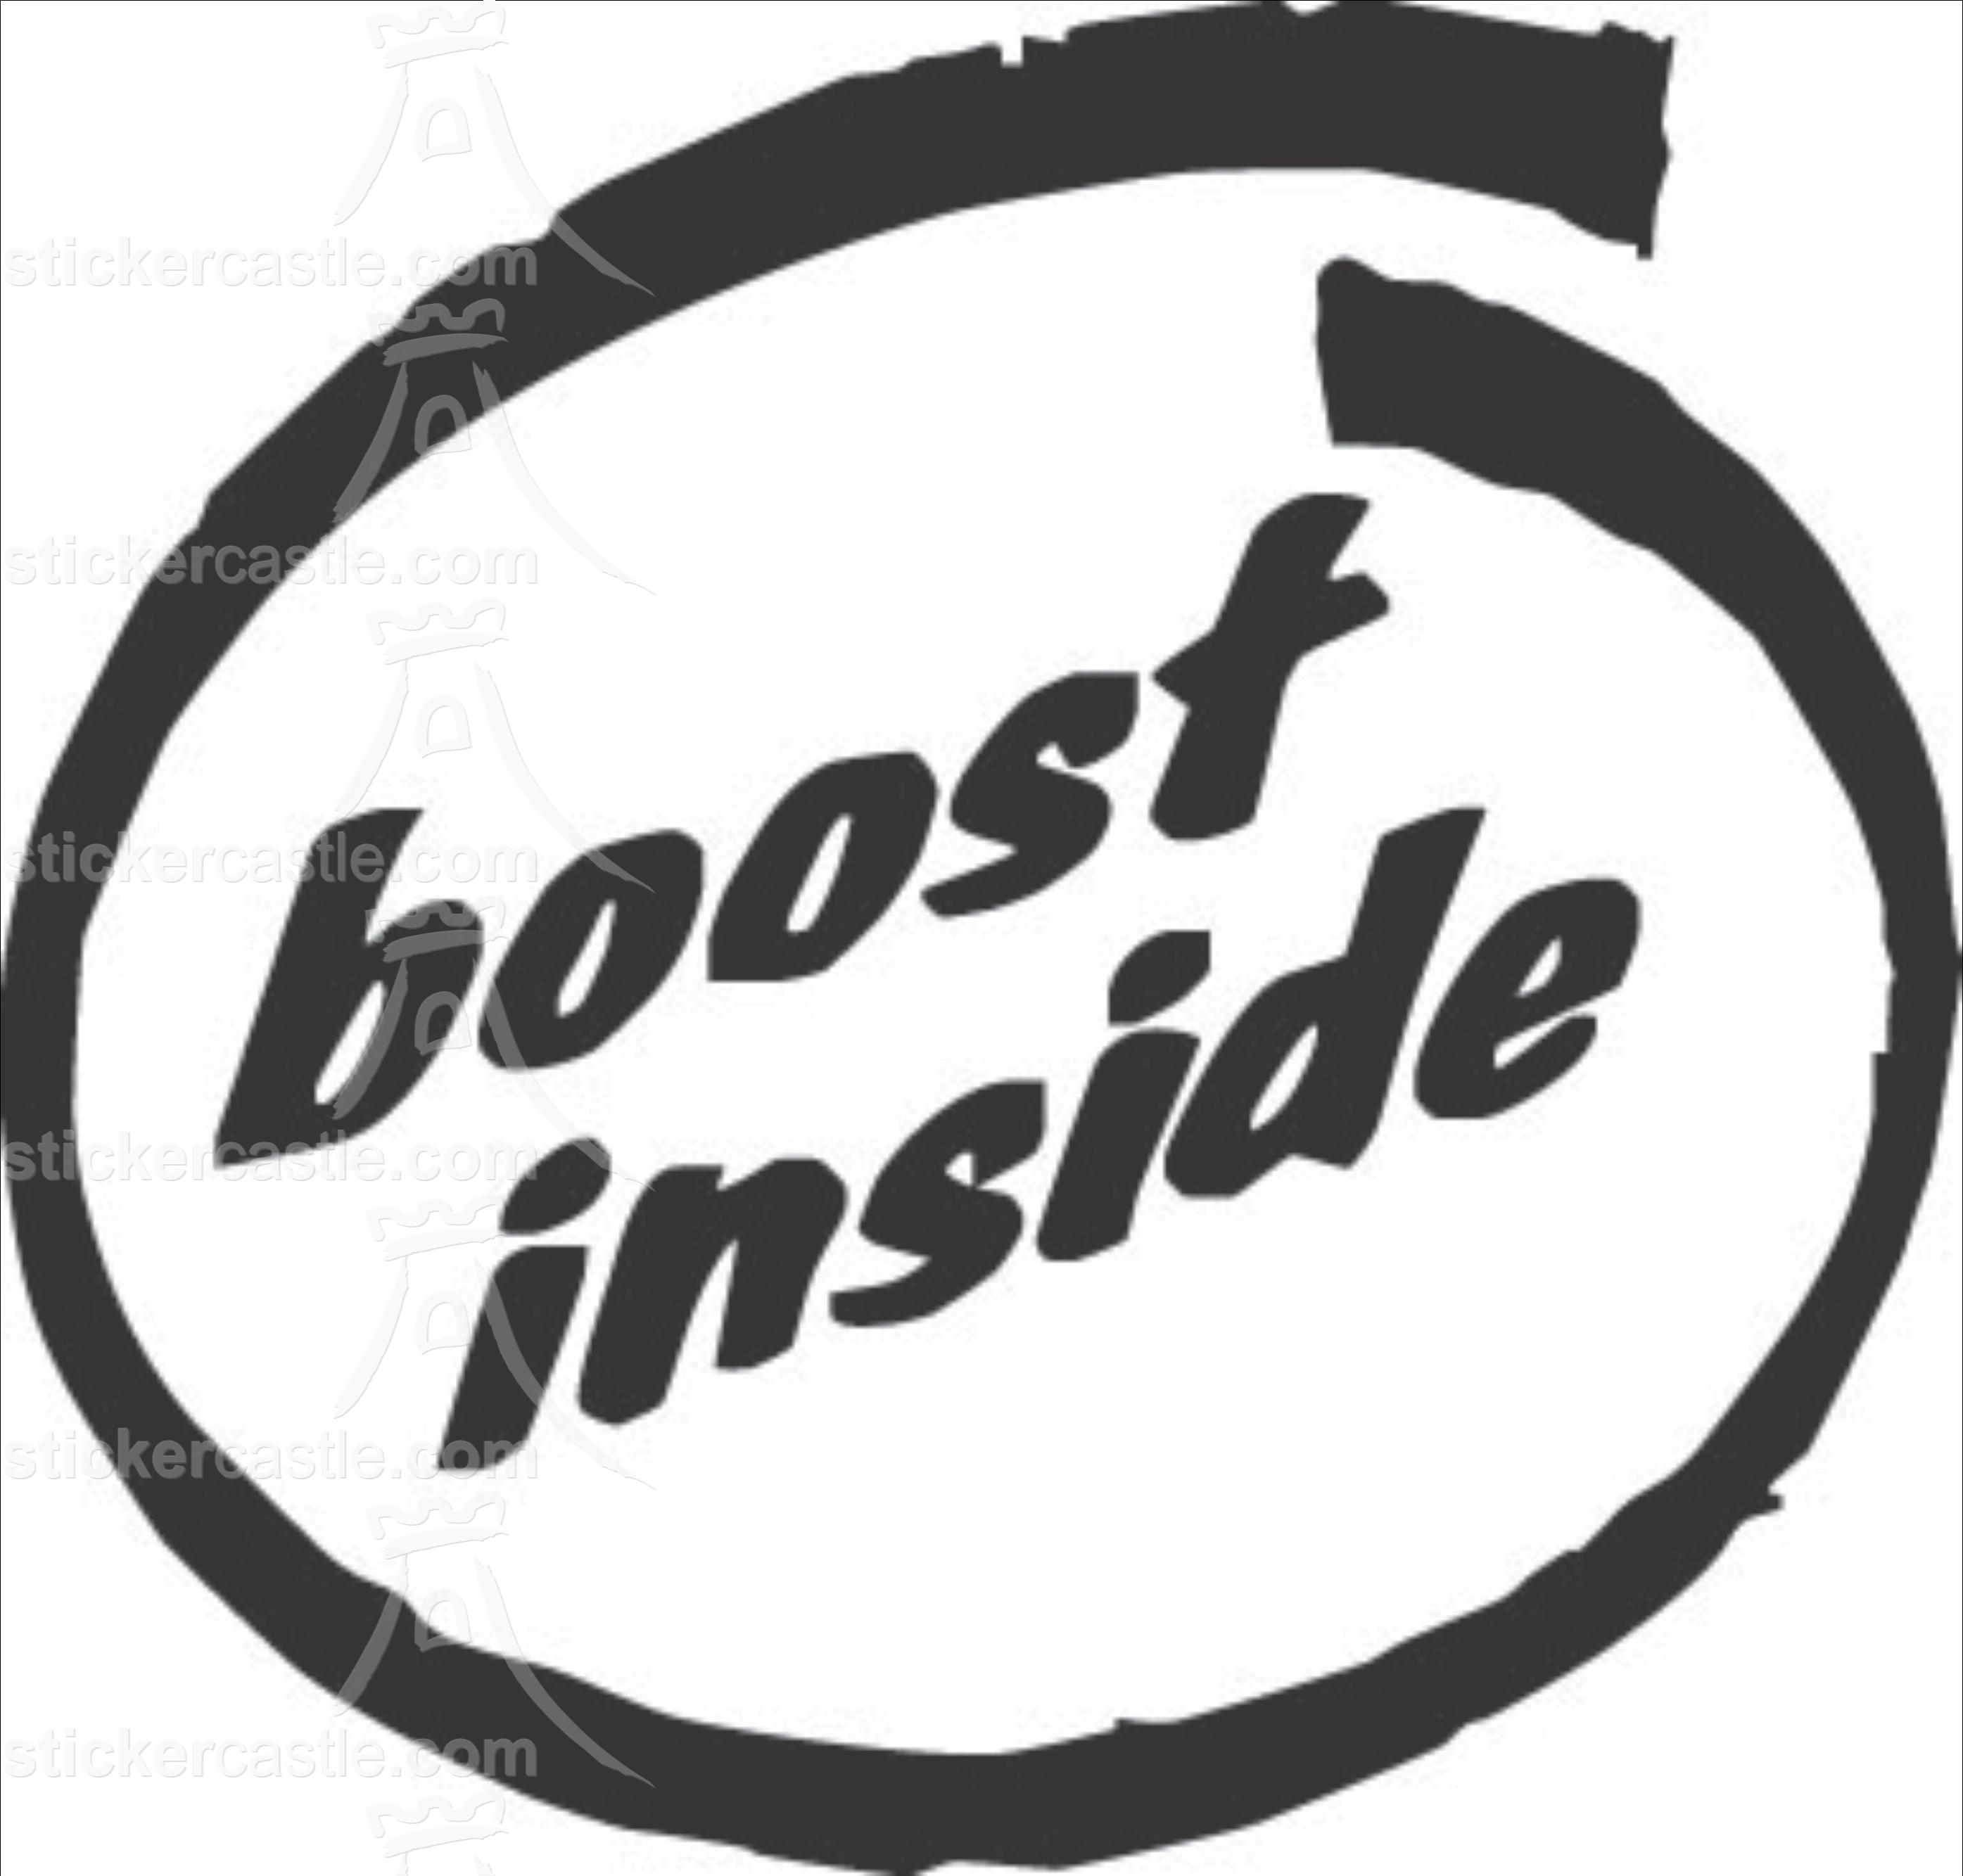 Street Racing Car Sticker Decal Ideas For Pop Pinterest - Vinyl decals for race cars